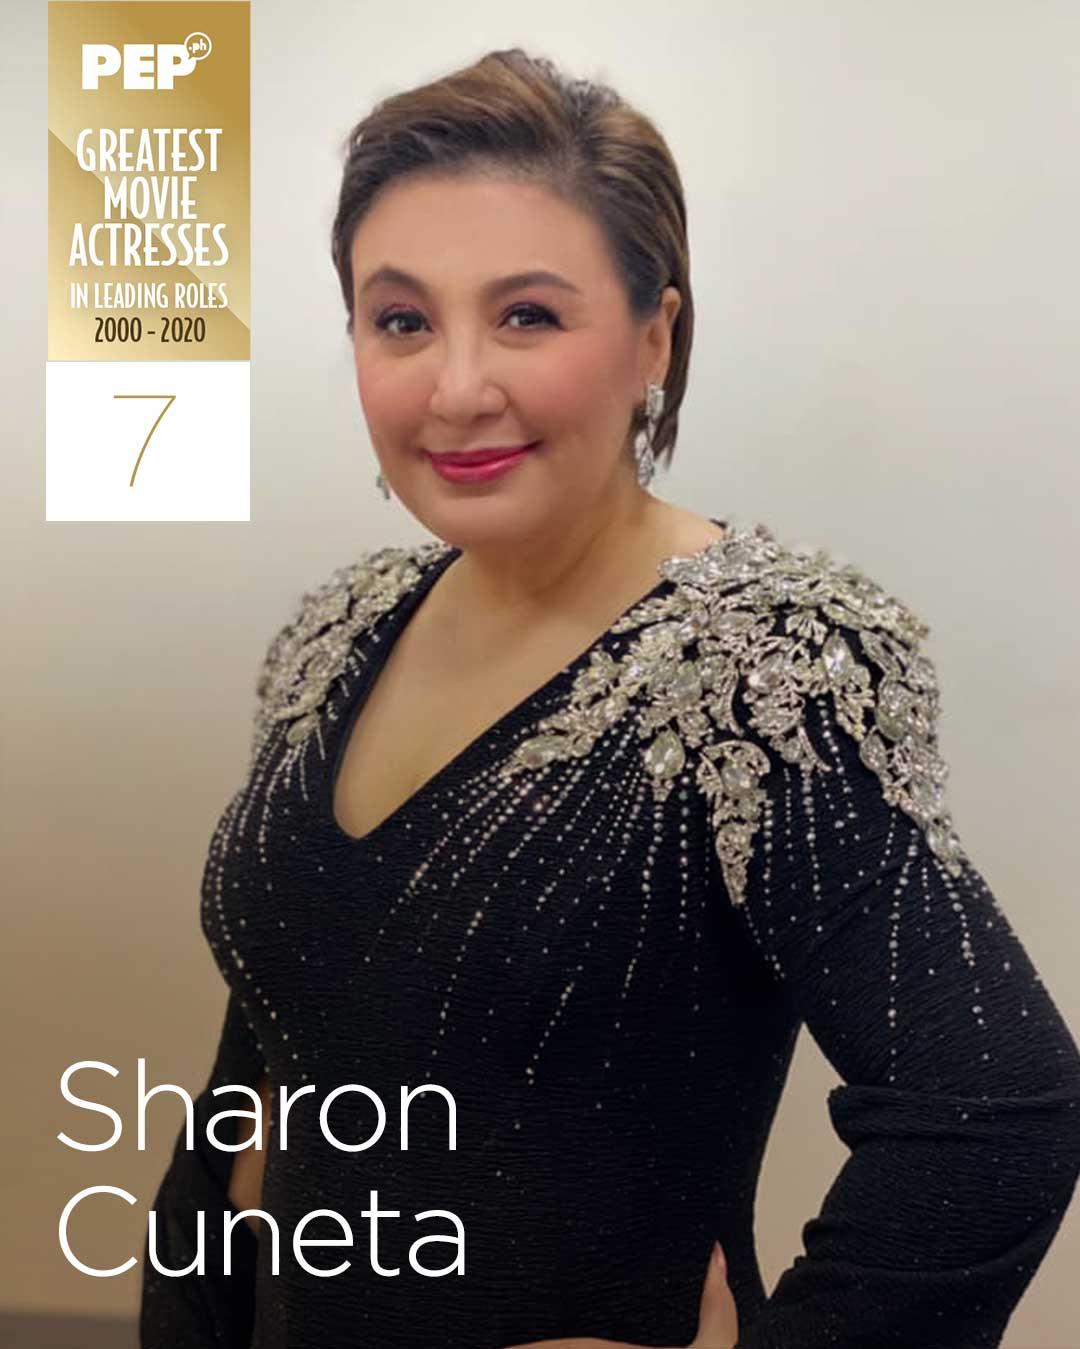 Sharon Cuneta, 15 Greatest Movie Actresses